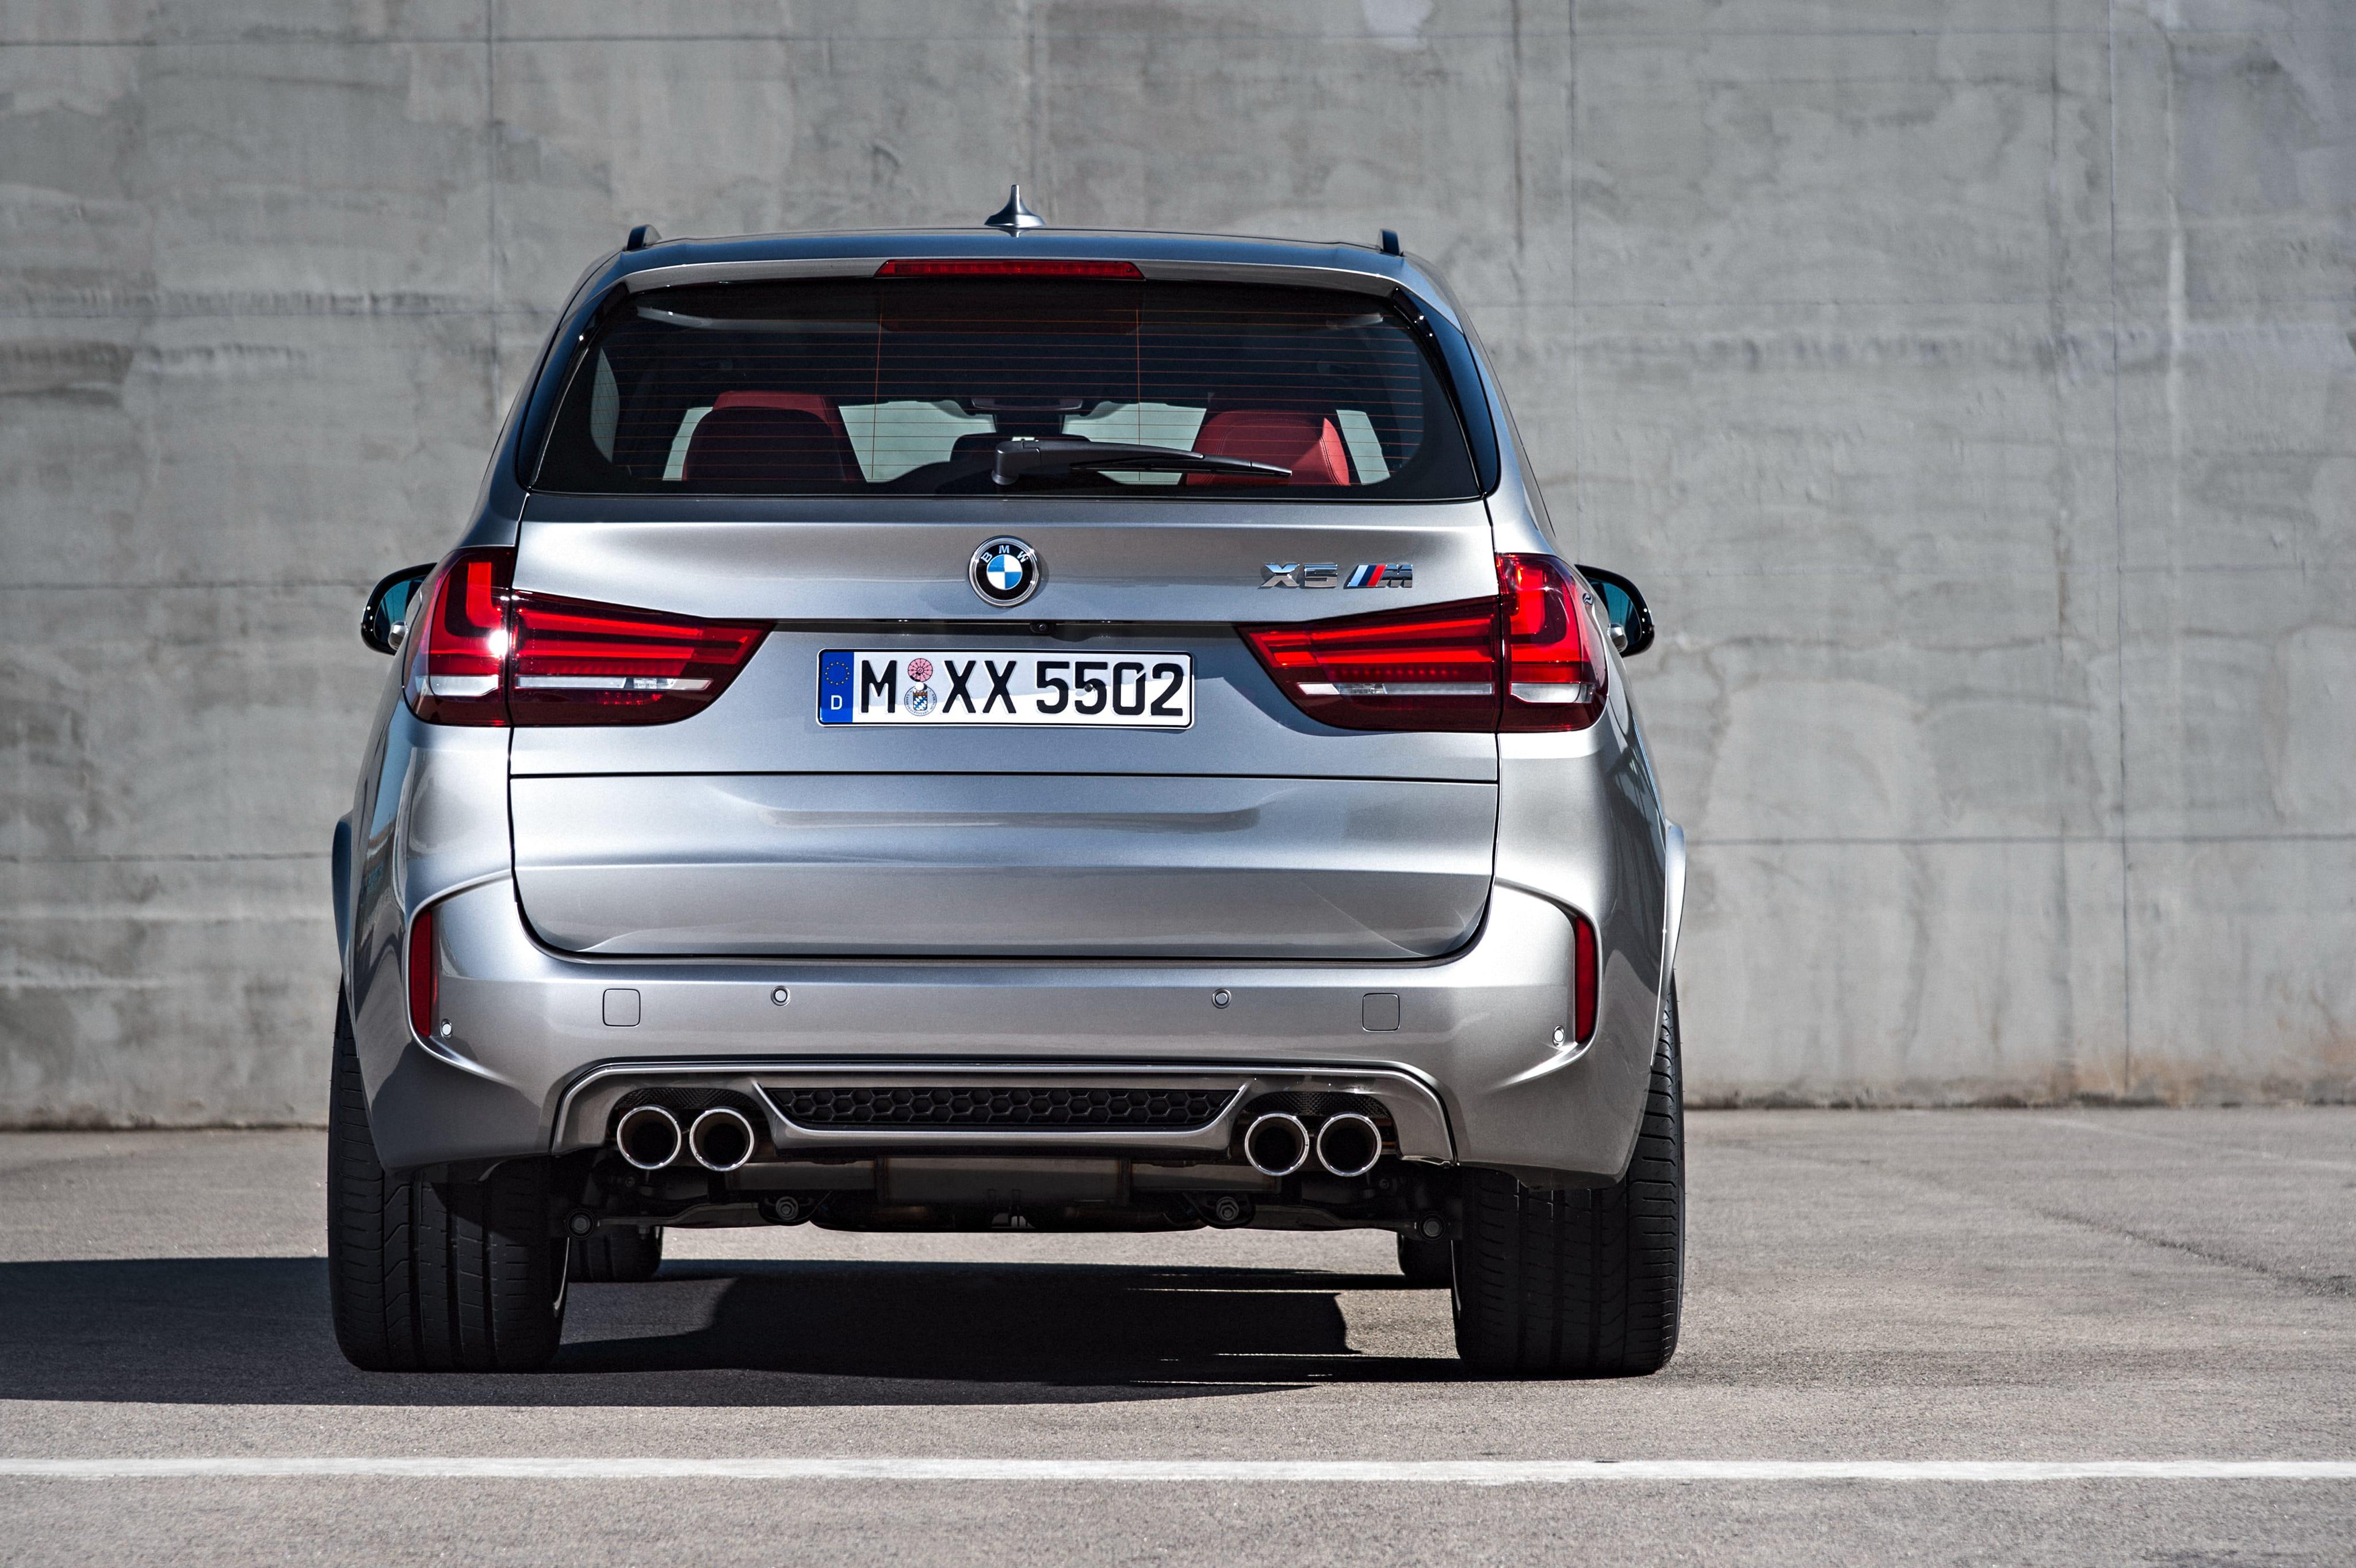 BMW X5M (F85) Free